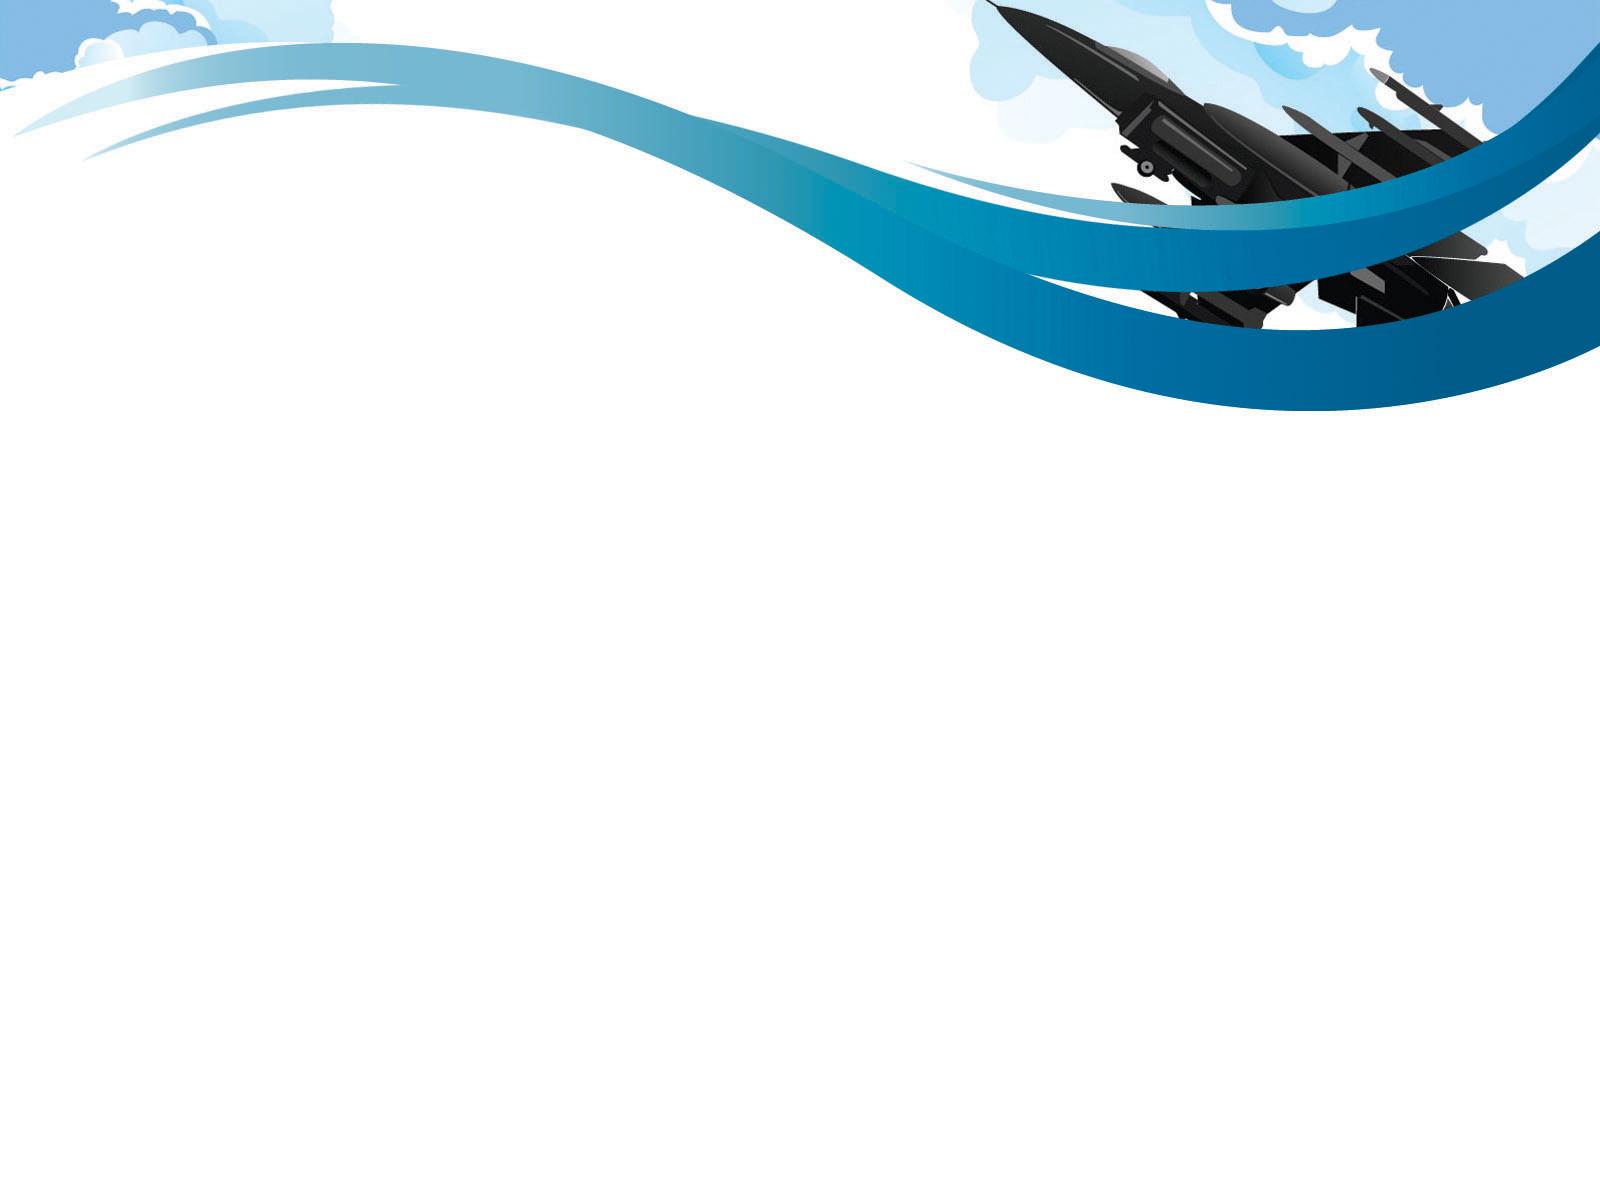 Air Force Powerpoint Templates - Black, Blue, Car Pertaining To Air Force Powerpoint Template